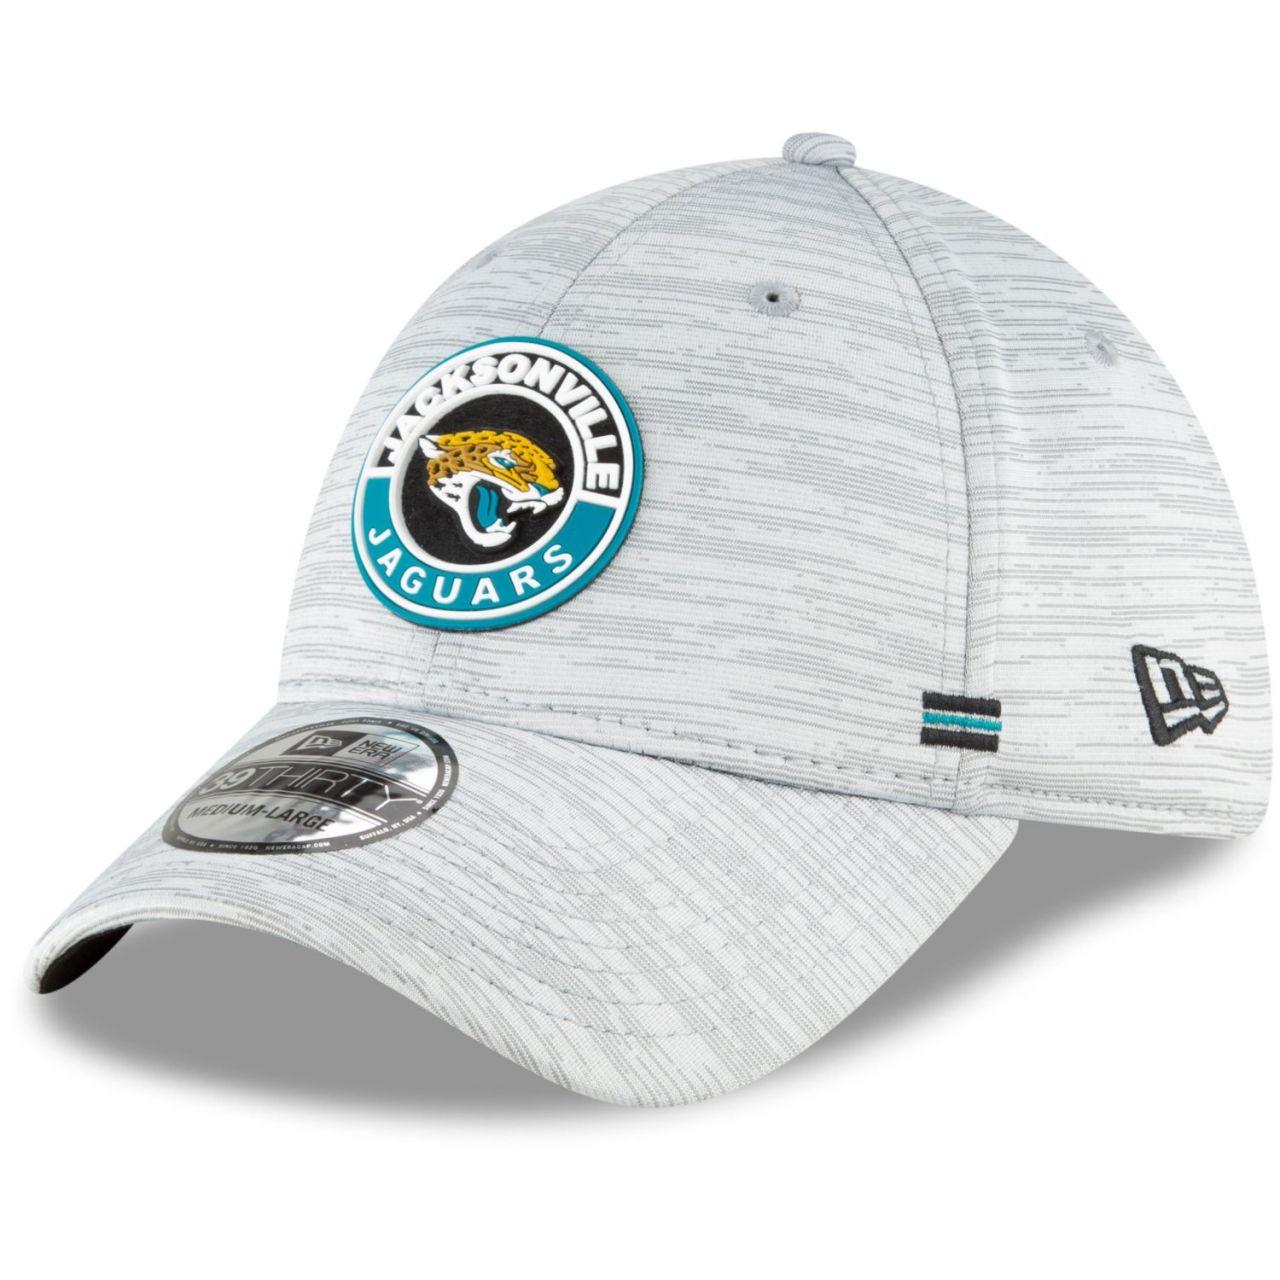 amfoo - New Era 39Thirty Cap - SIDELINE 2020 Jacksonville Jaguars